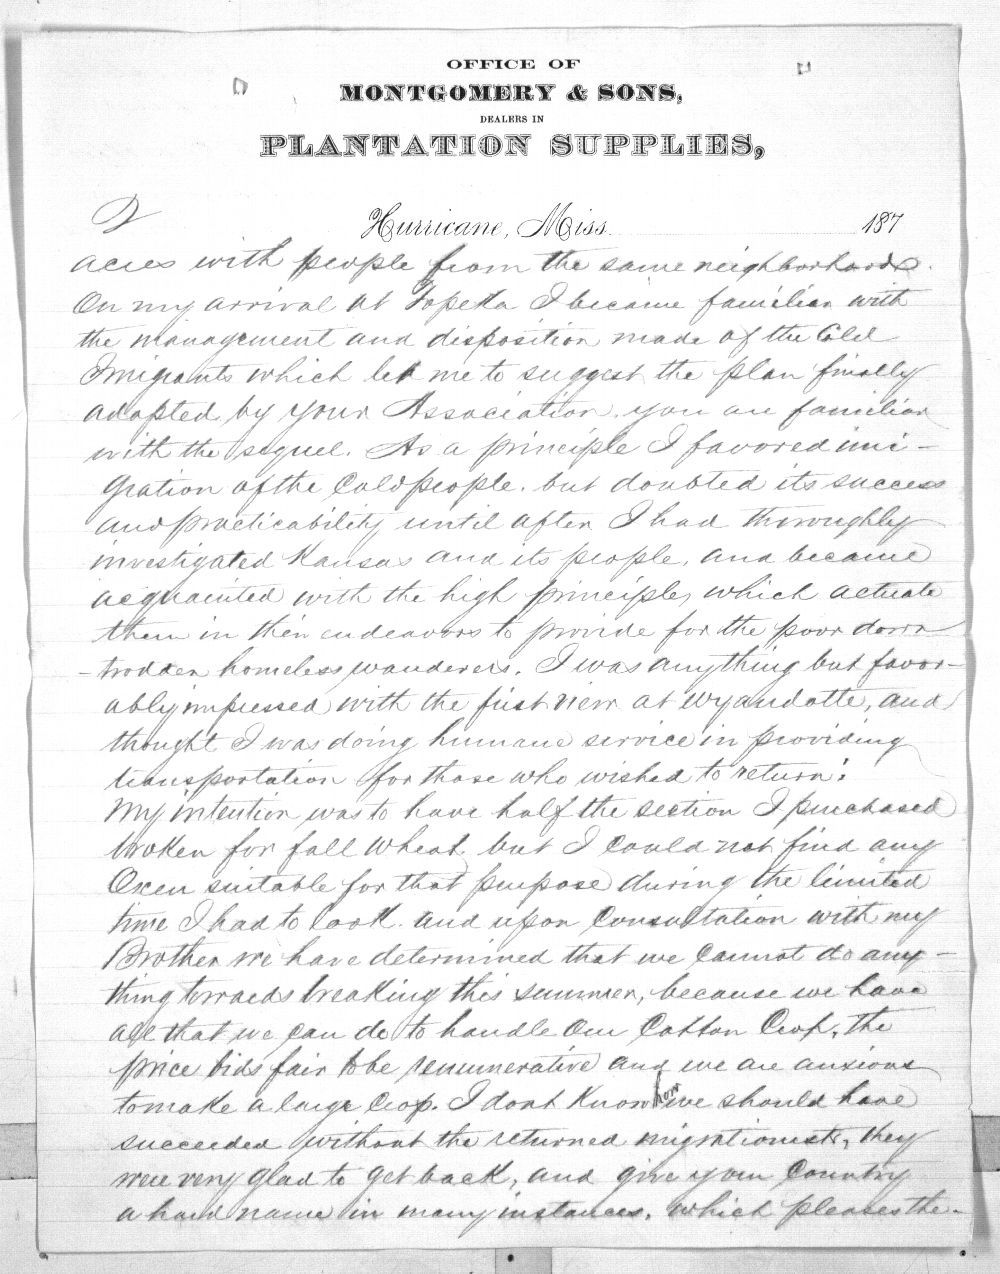 Isaiah T. Montgomery to Governor John P. St. John - 3